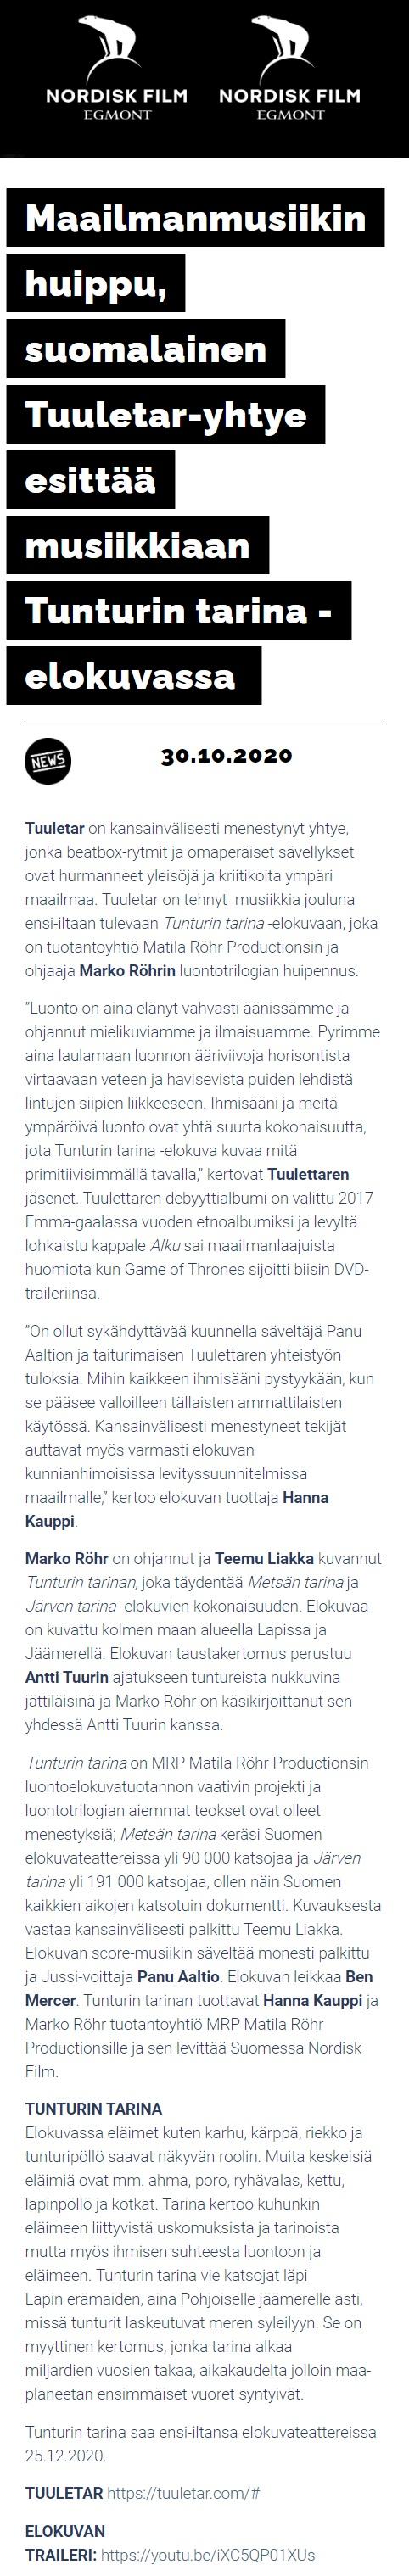 Nordisk Film (Finland), 30.10.2020